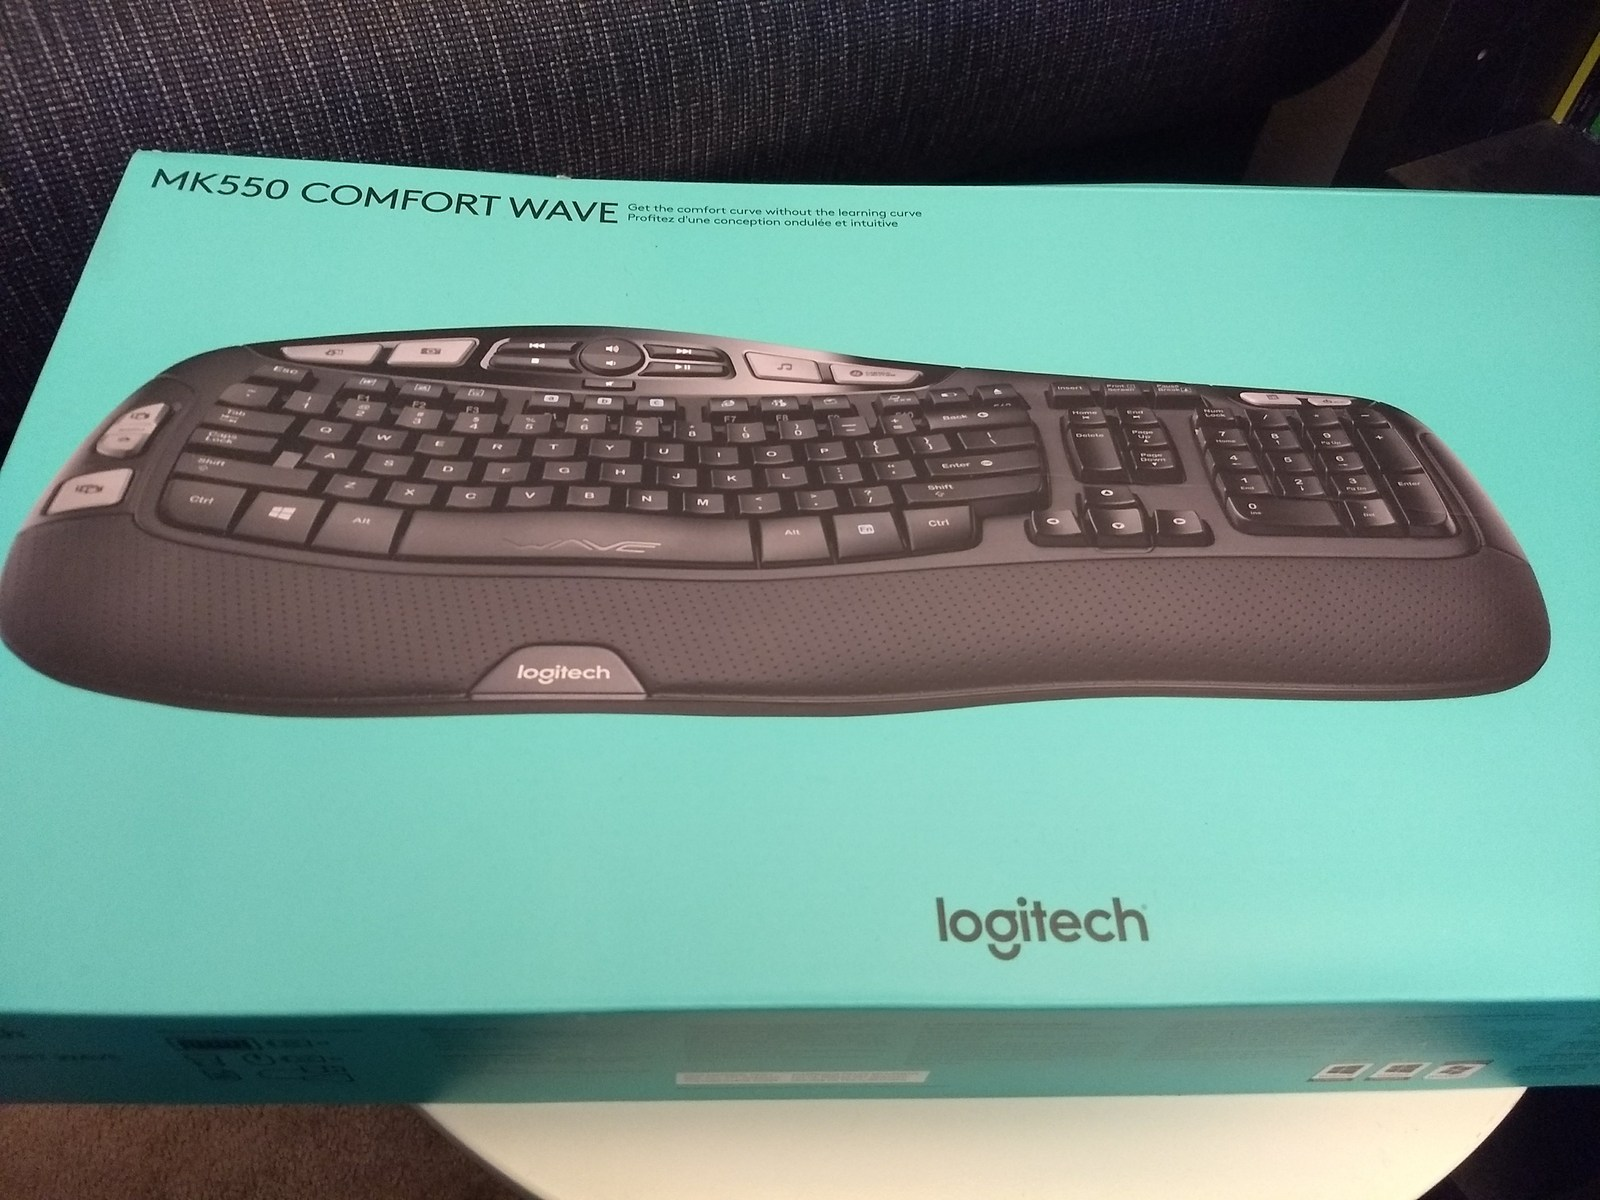 Logitech MK550 Comfort Wave Wireless Keyboard Combo